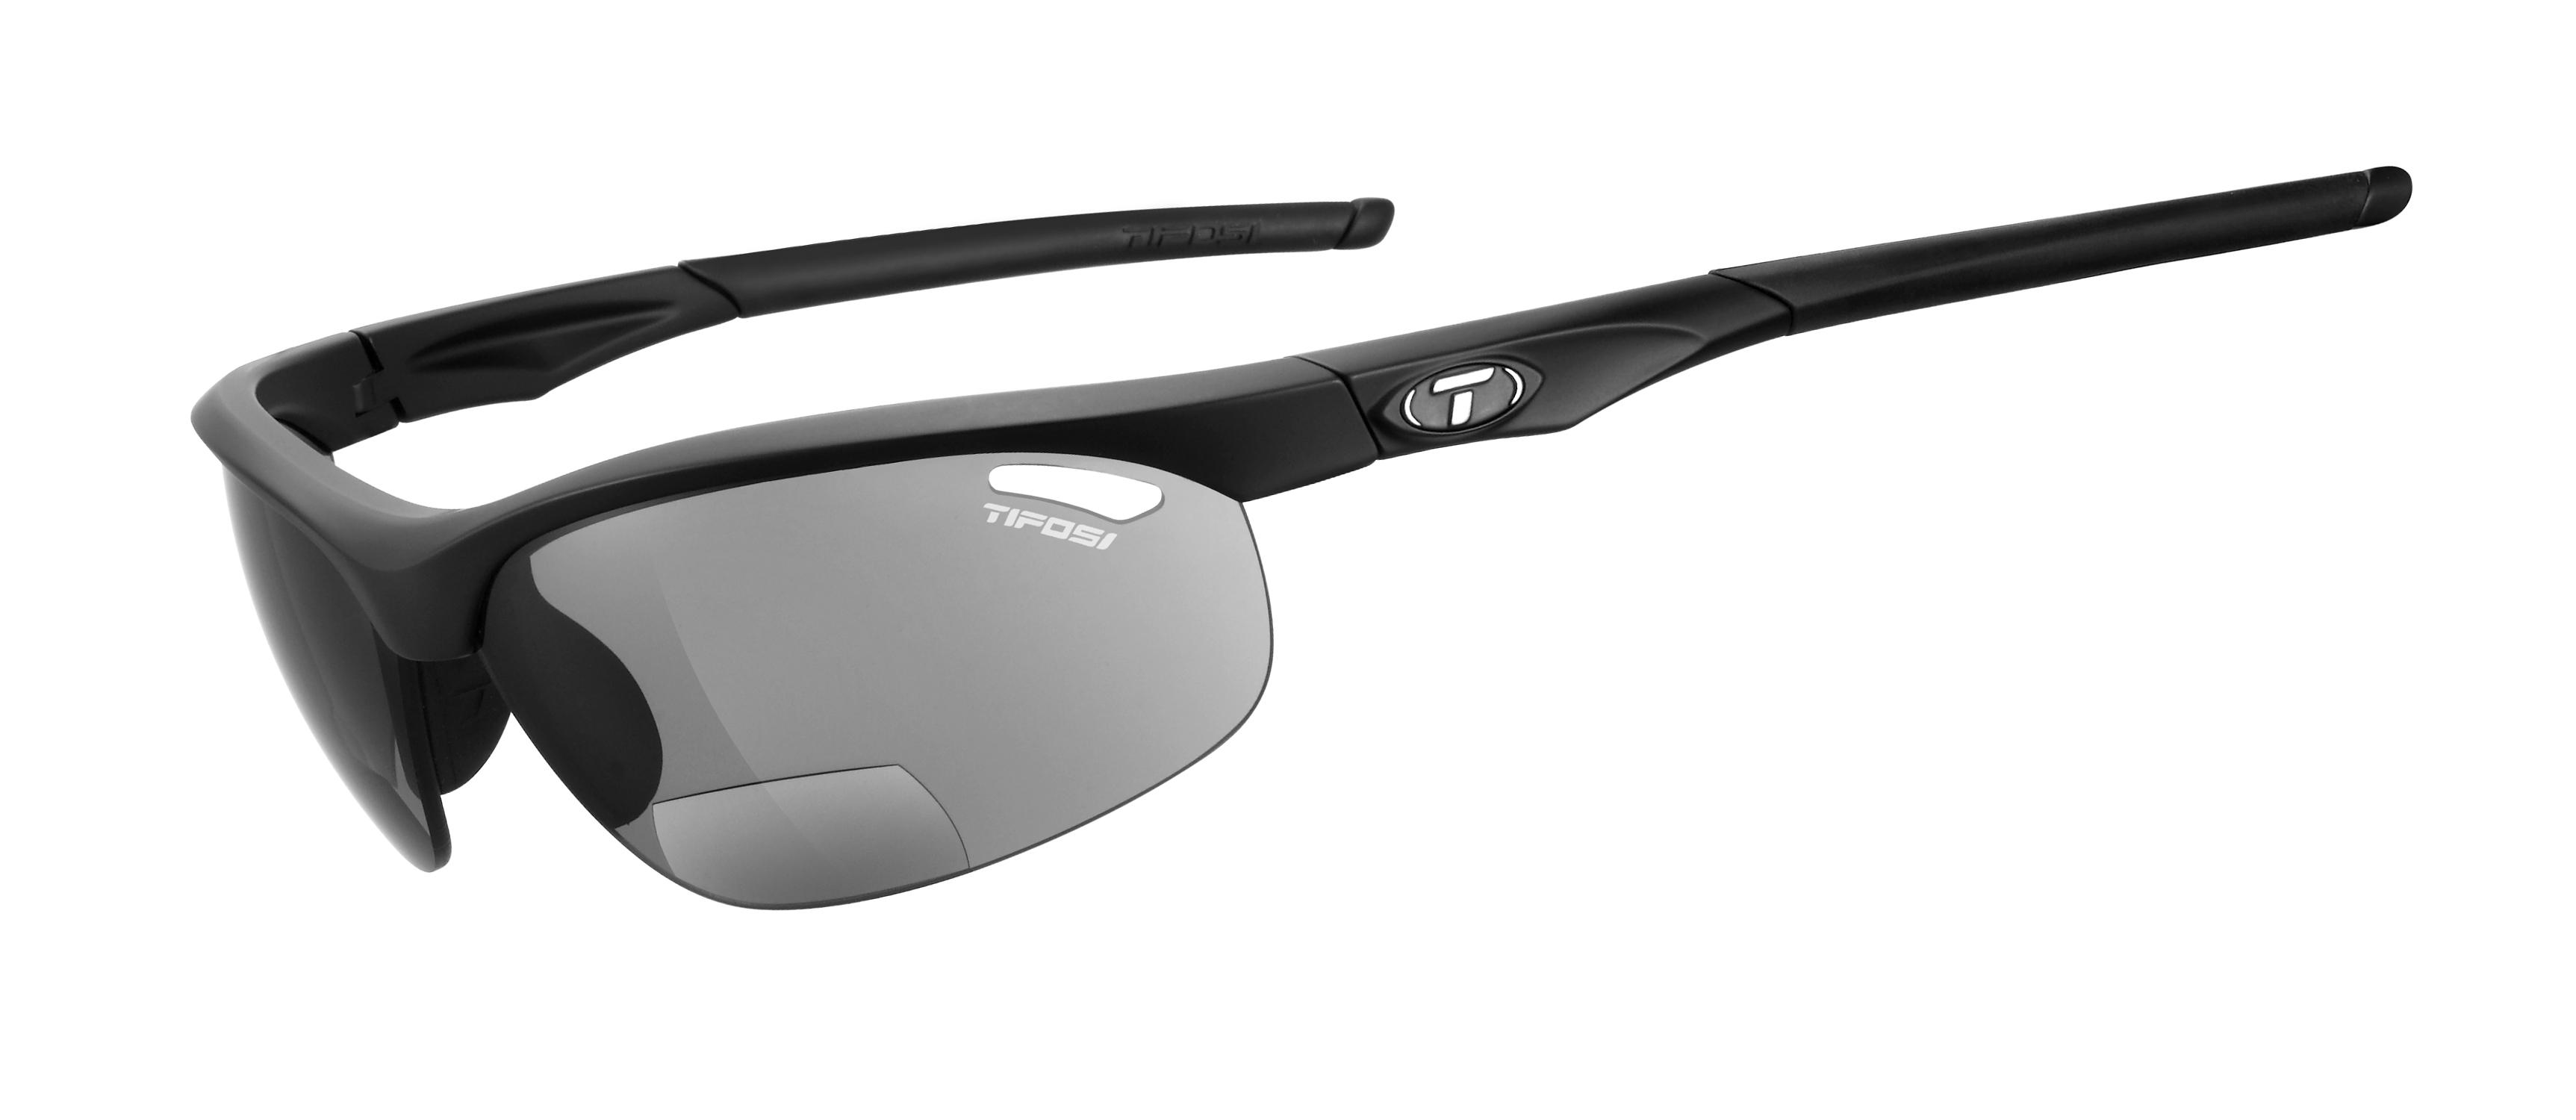 Tifosi Veloce Matt Black Smoke Reader +1.5 Cykeltøj  Solbriller